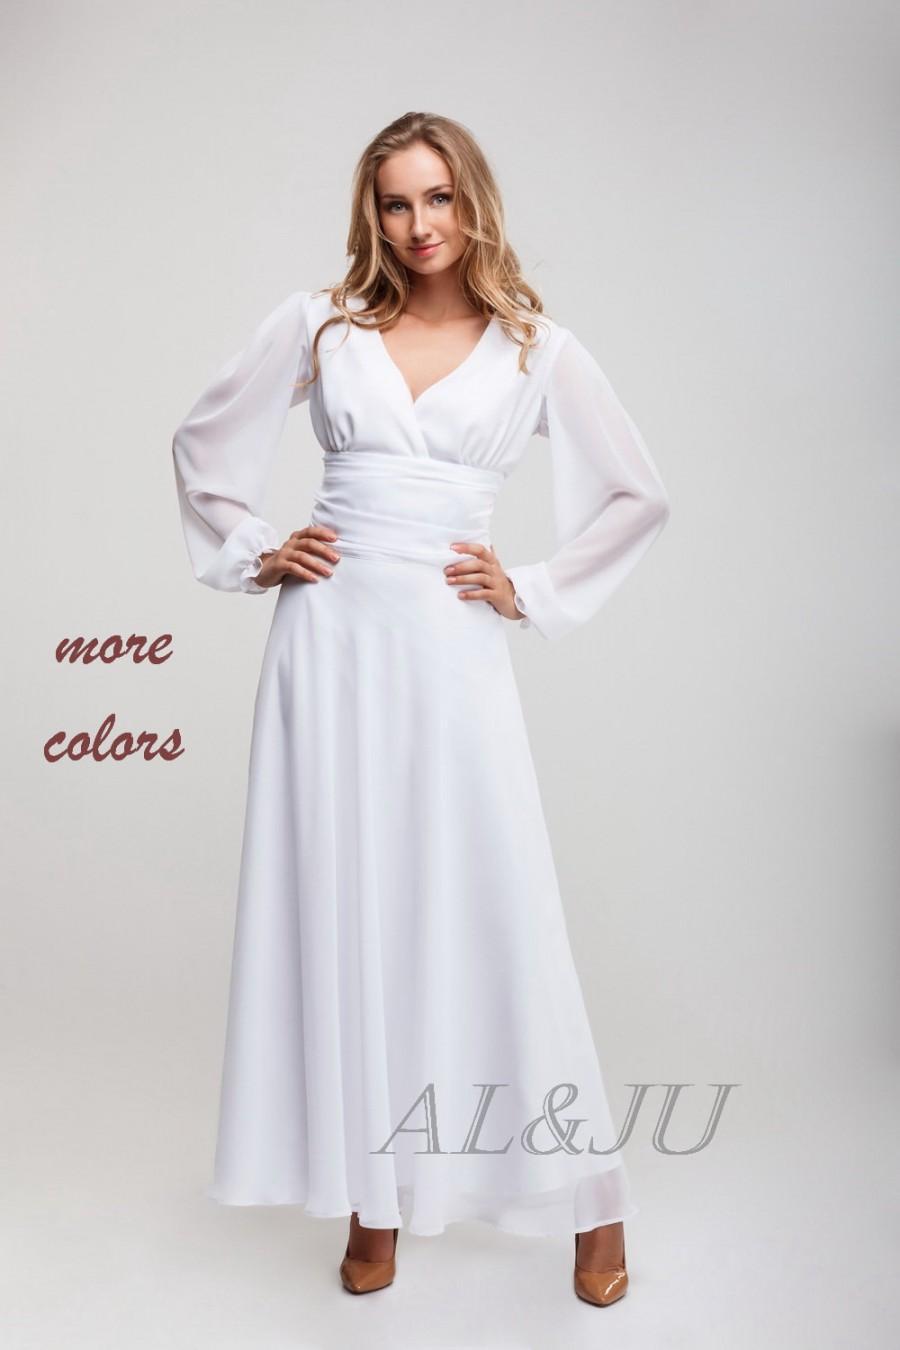 Wedding - White long dress, chiffon dress floor length, evening dress with sleeves,white wedding dress, bridesmaid dress chiffon, V-neck dress.